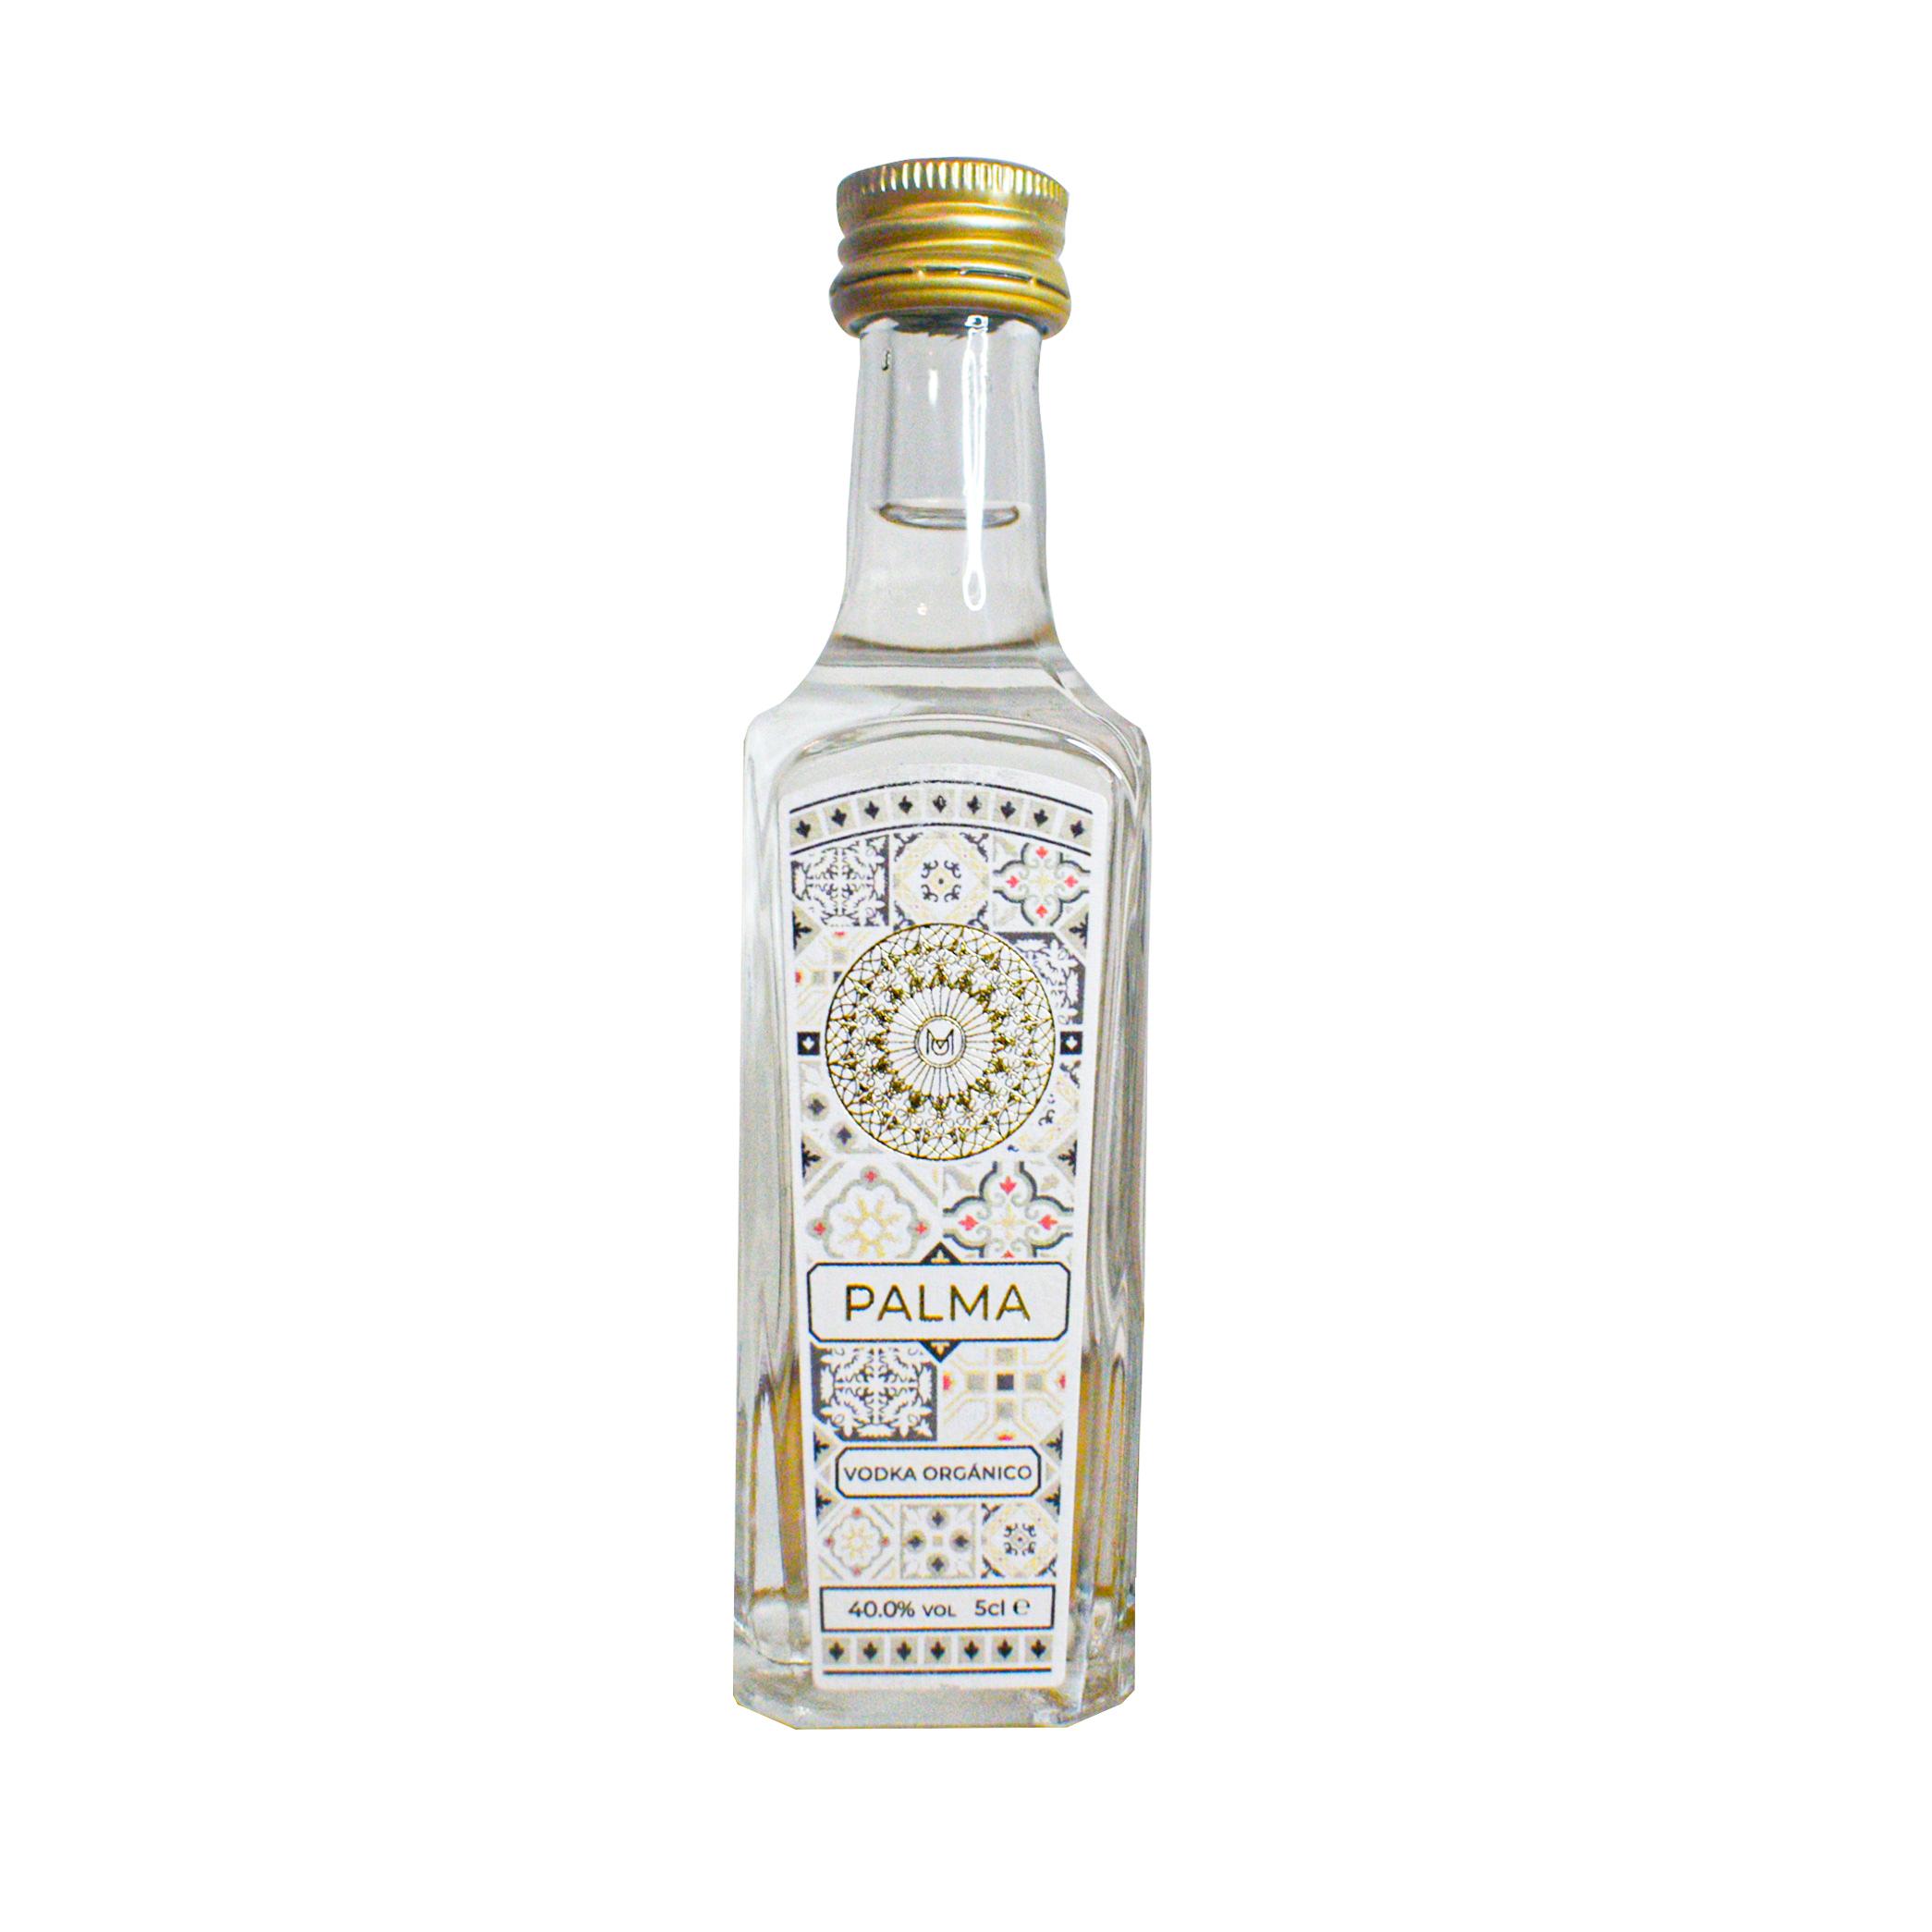 PALMA Vodka Probierflasche 5cl